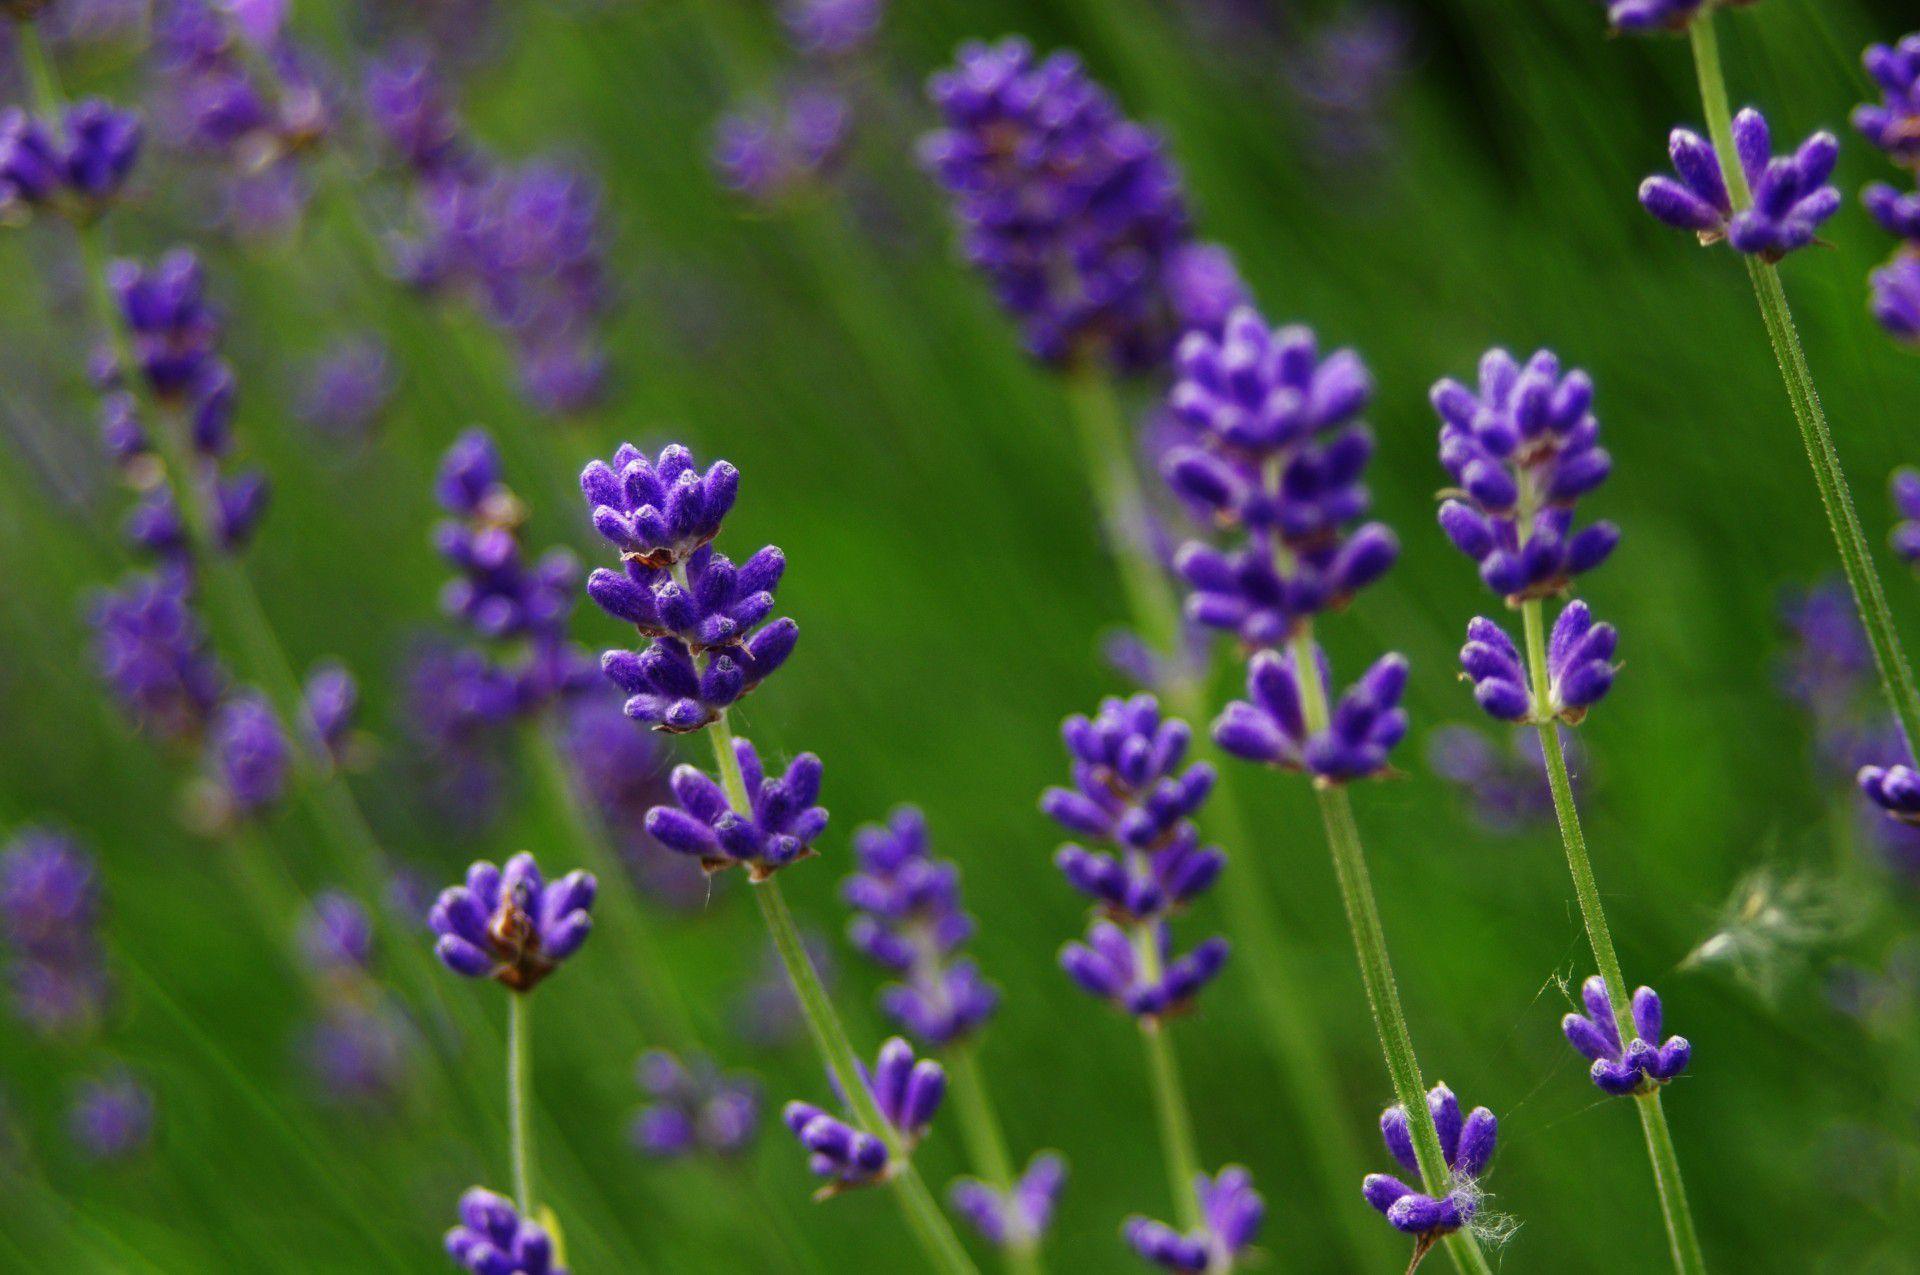 Lavender Hd Desktop